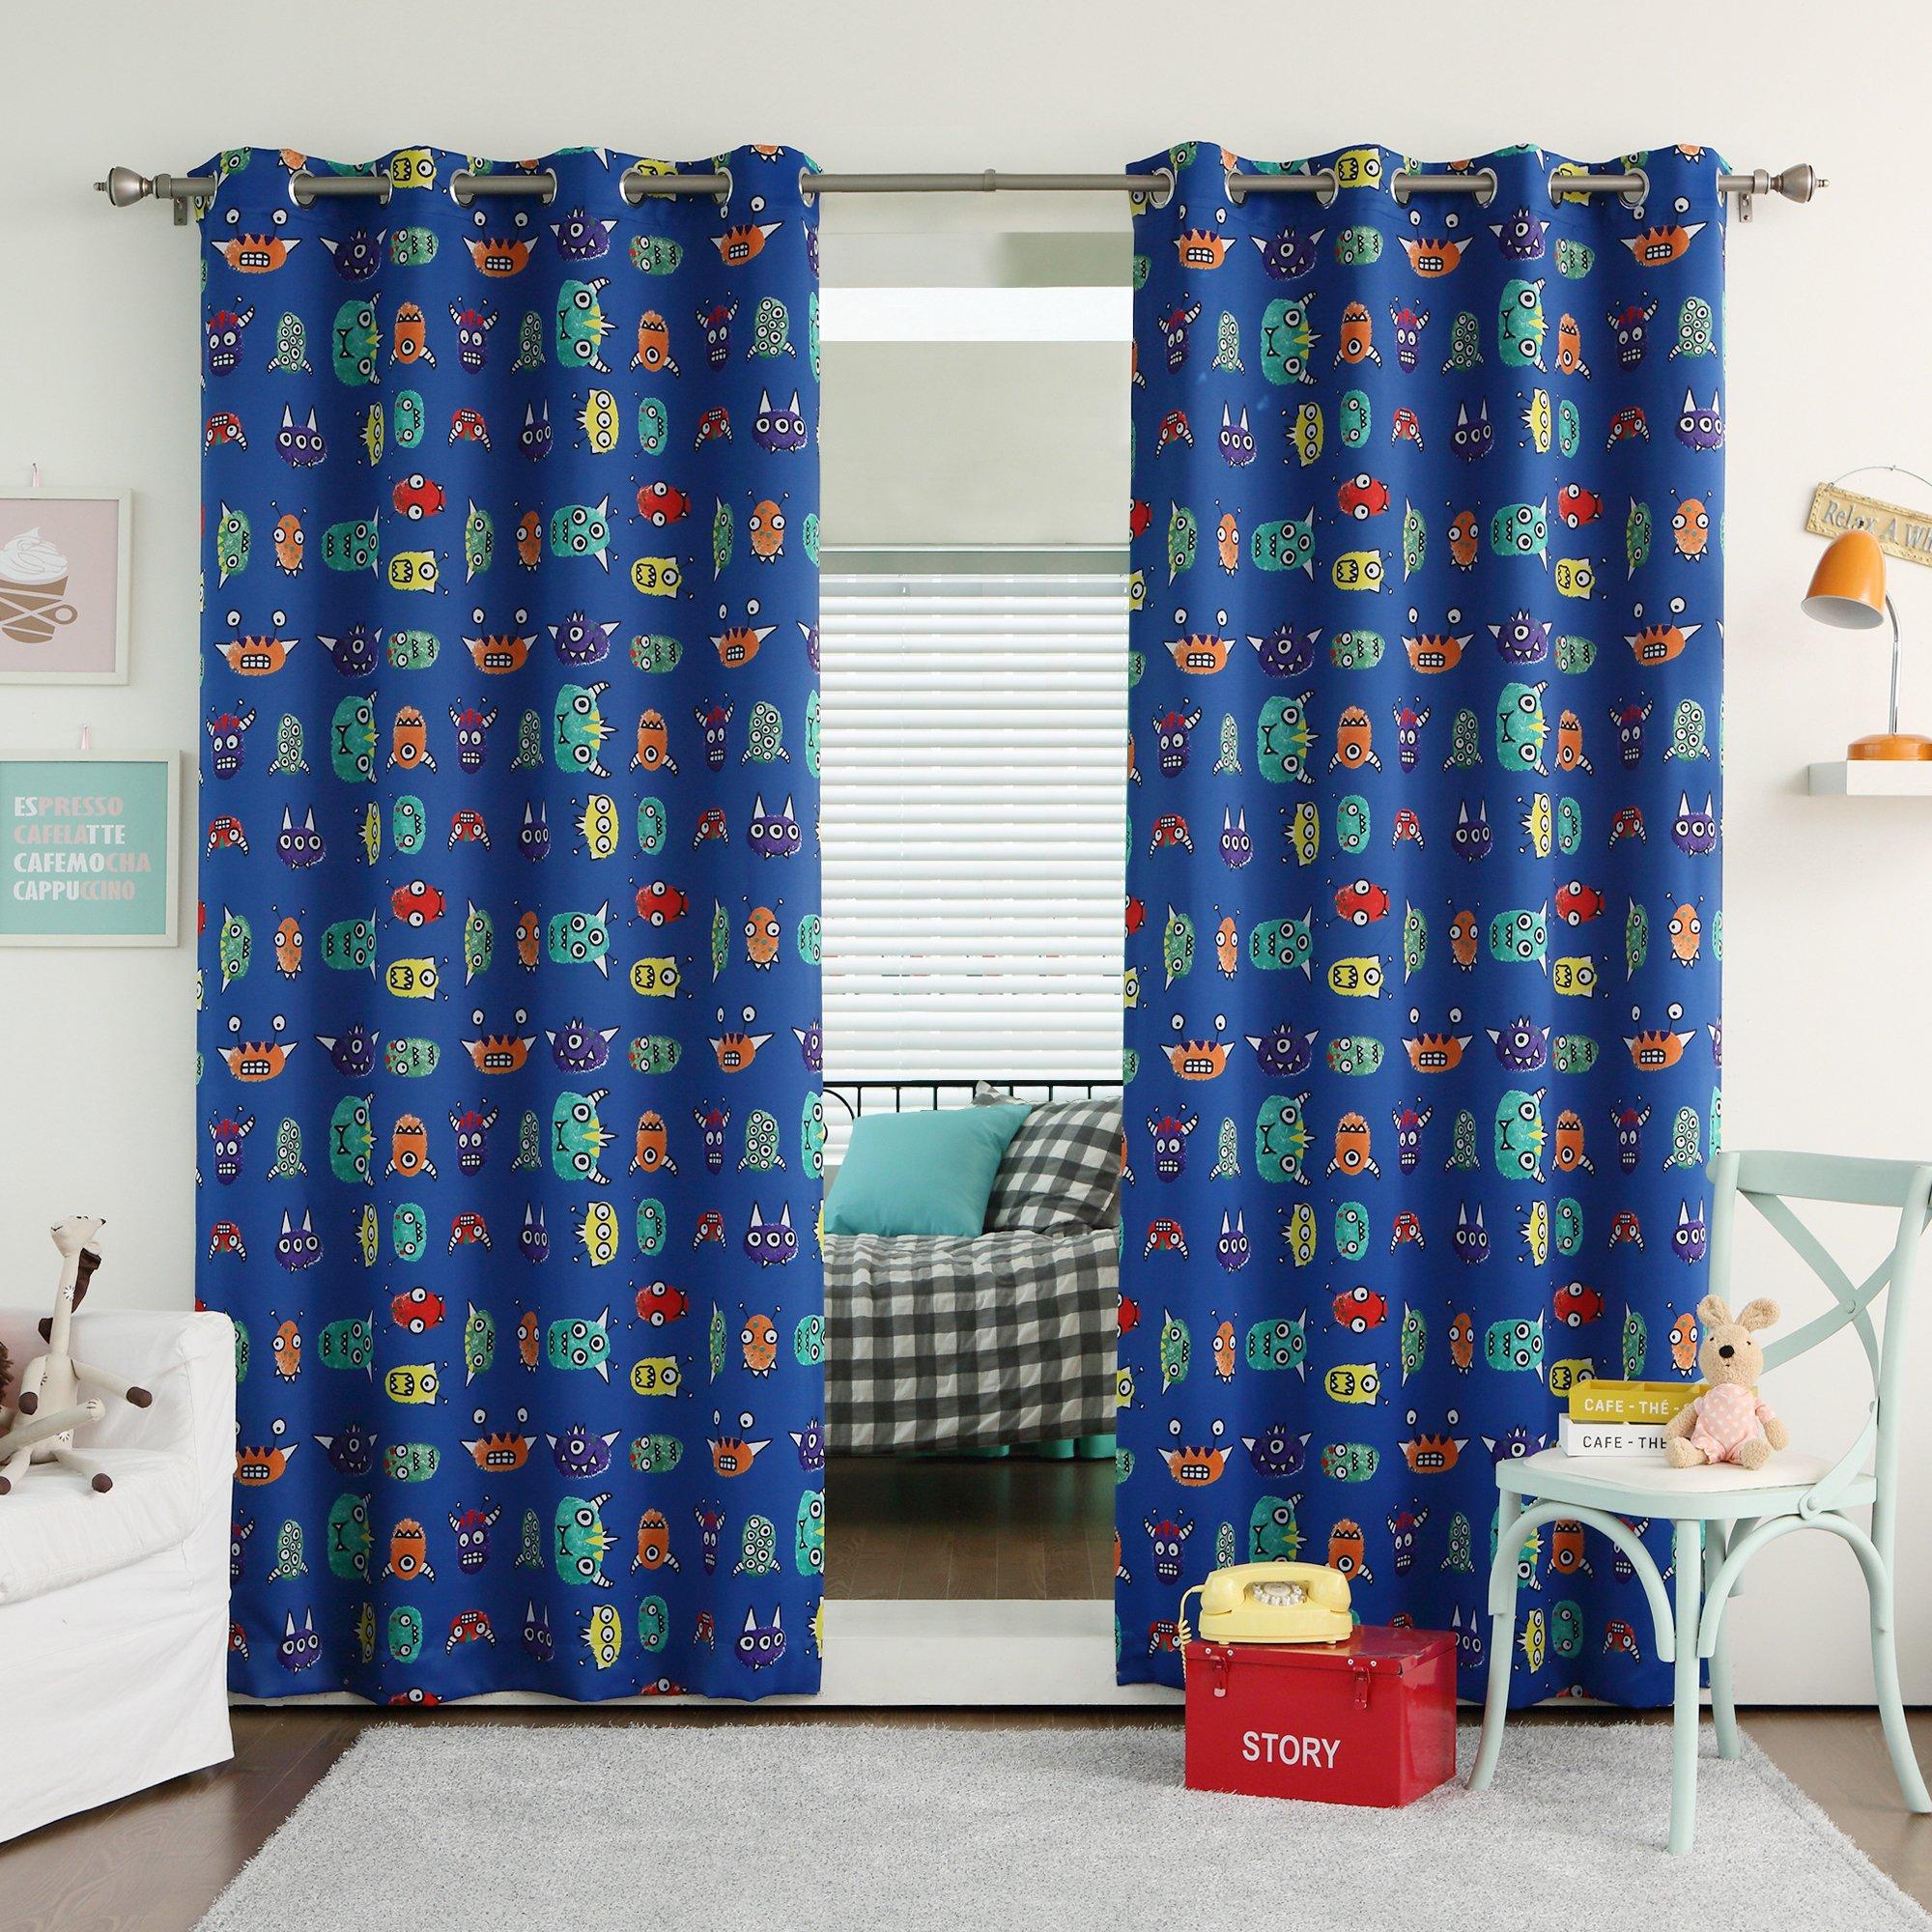 Best Home Fashion Room Darkening Monster Print Curtains - Stainless Steel Nickel Grommet Top - Royal Blue - 52''W x 63''L - (Set of 2 Panels)